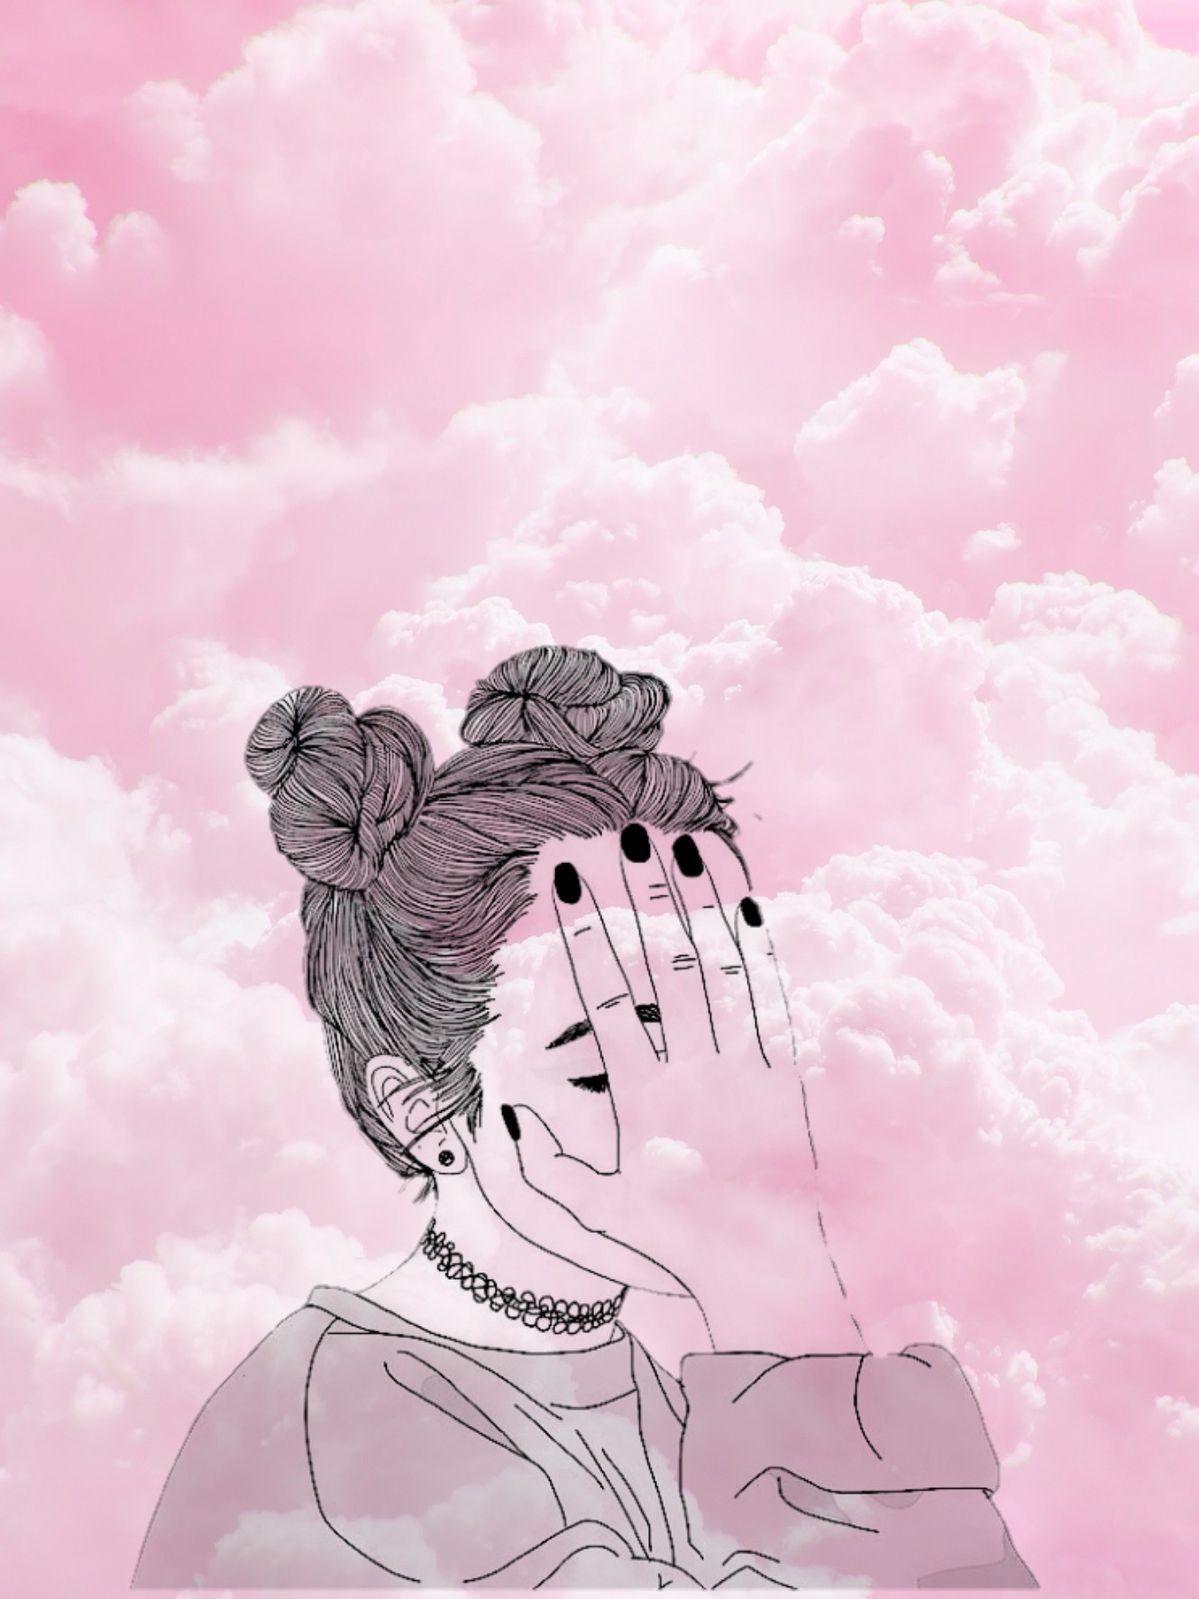 Pin De Flowers In Heart Em Girls Em 2019 Desenhos De